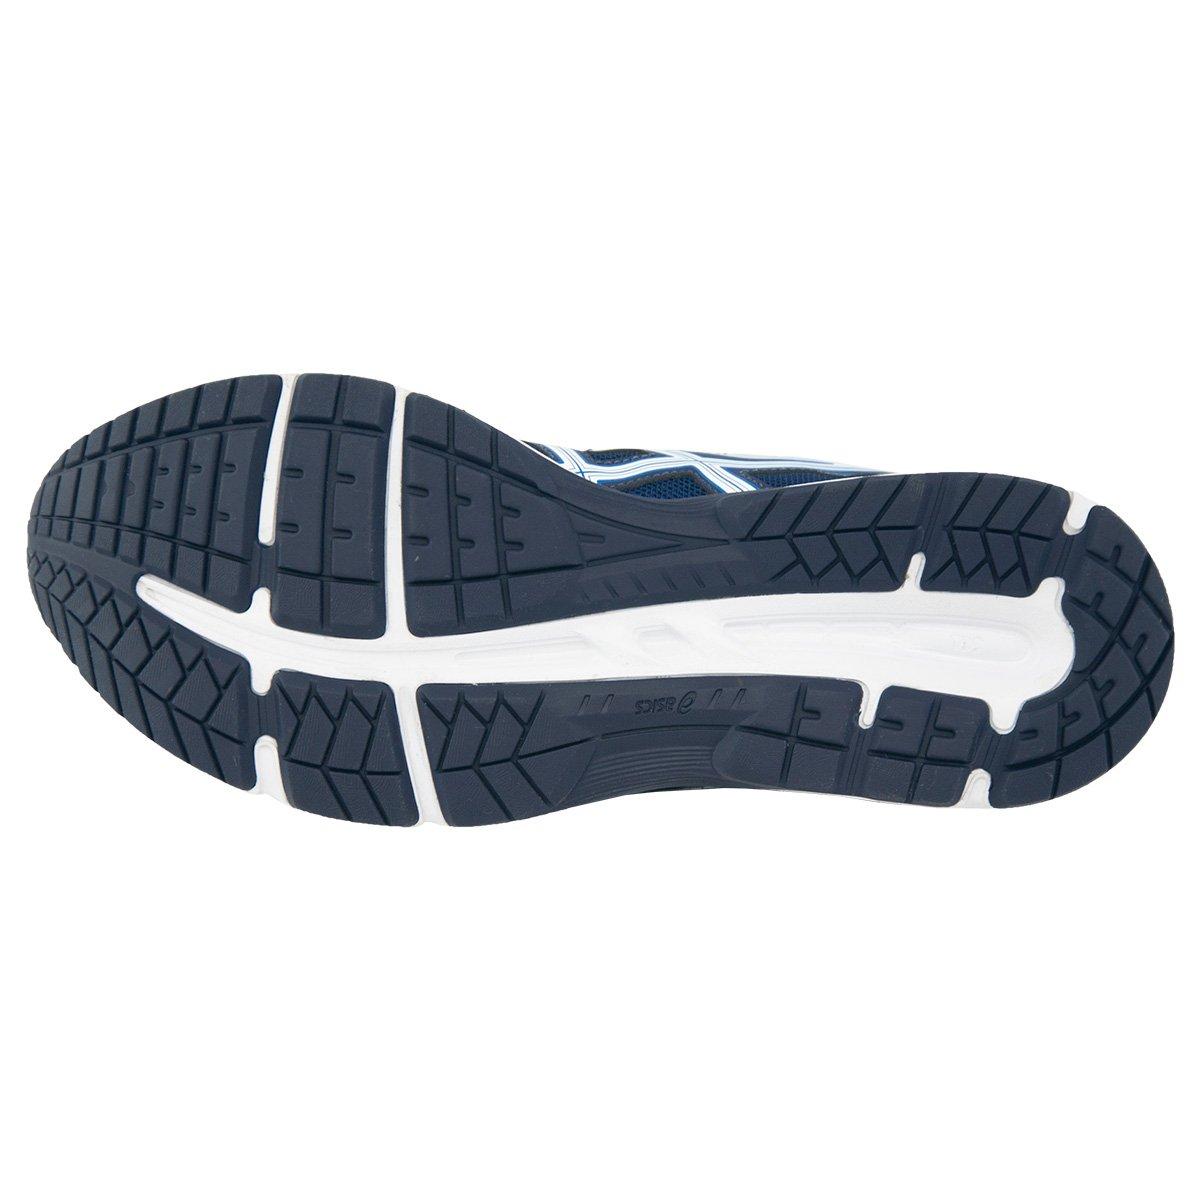 56b21c0d85a Tênis Asics Gel Contend 5 Masculino - Tam  43 - Shopping TudoAzul